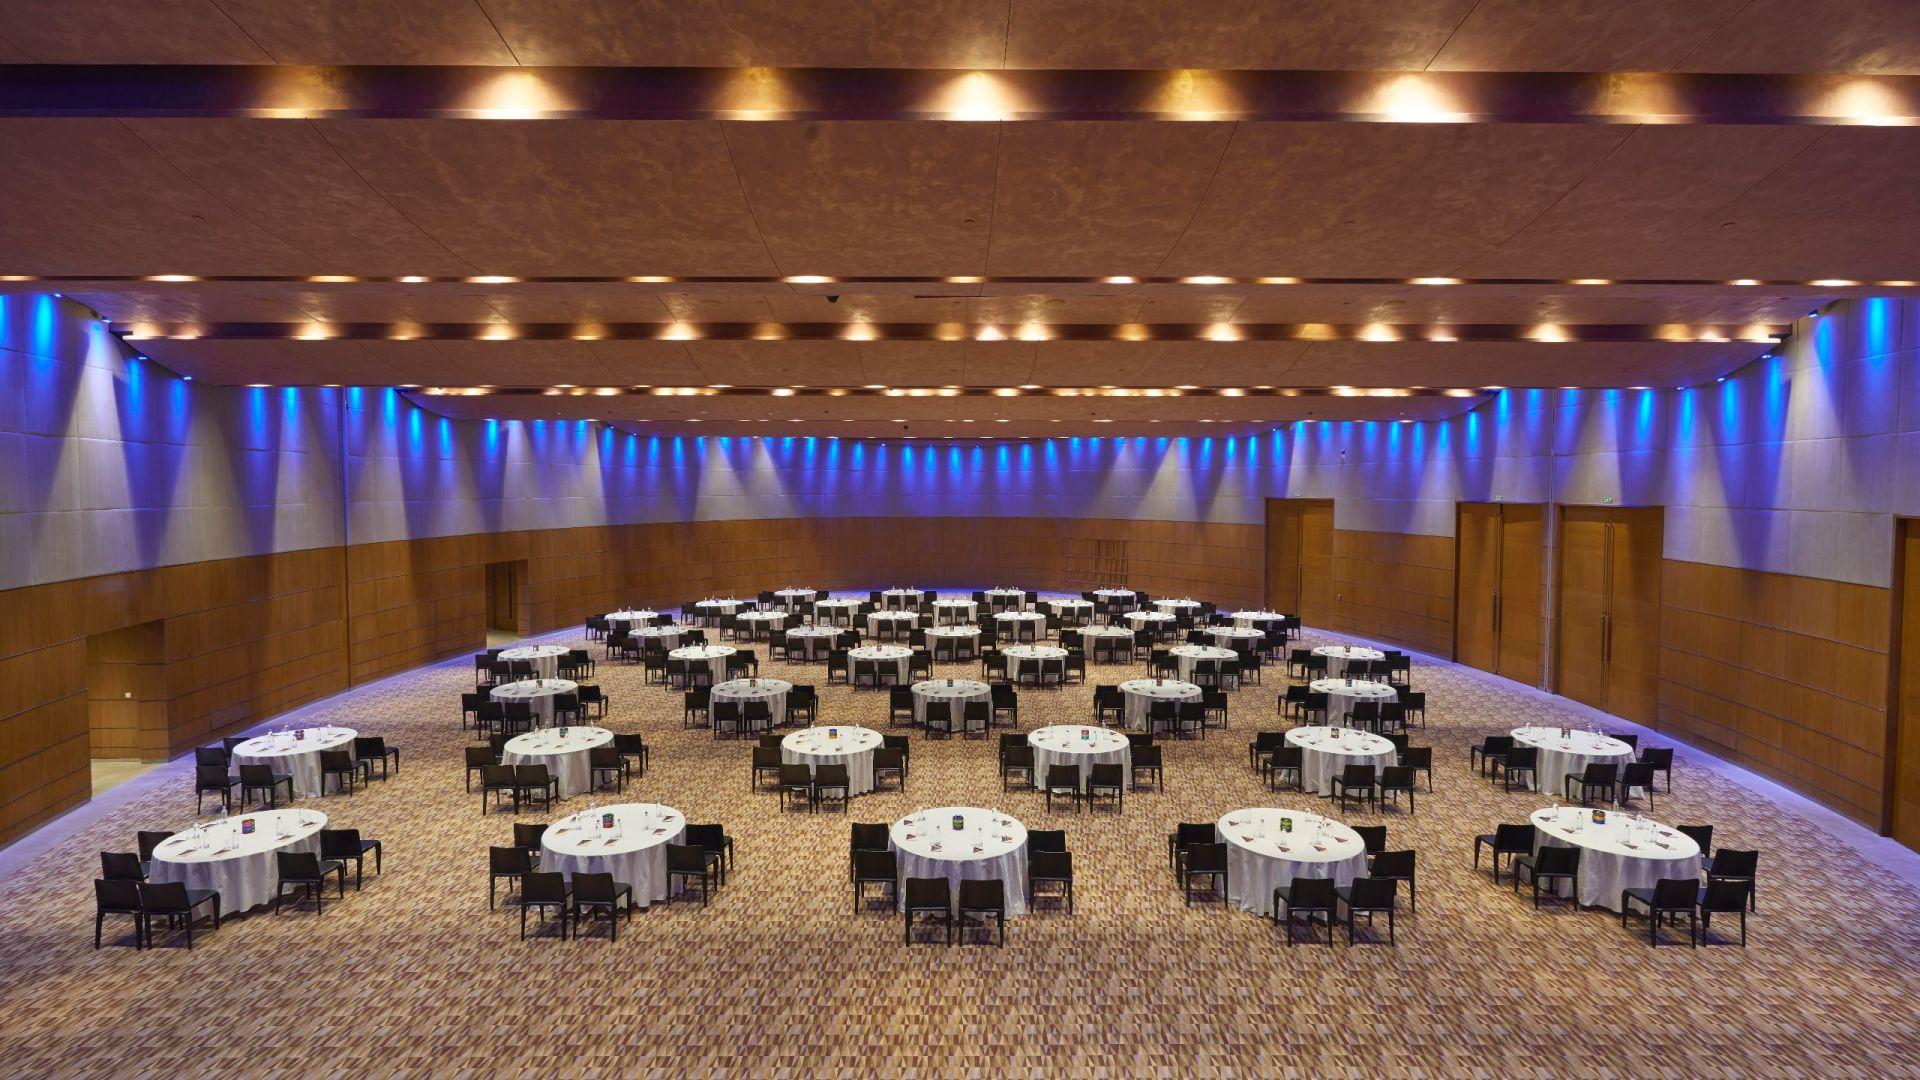 Andaz Delhi Ballroom - Top meeting and wedding venue in Aerocity Delhi